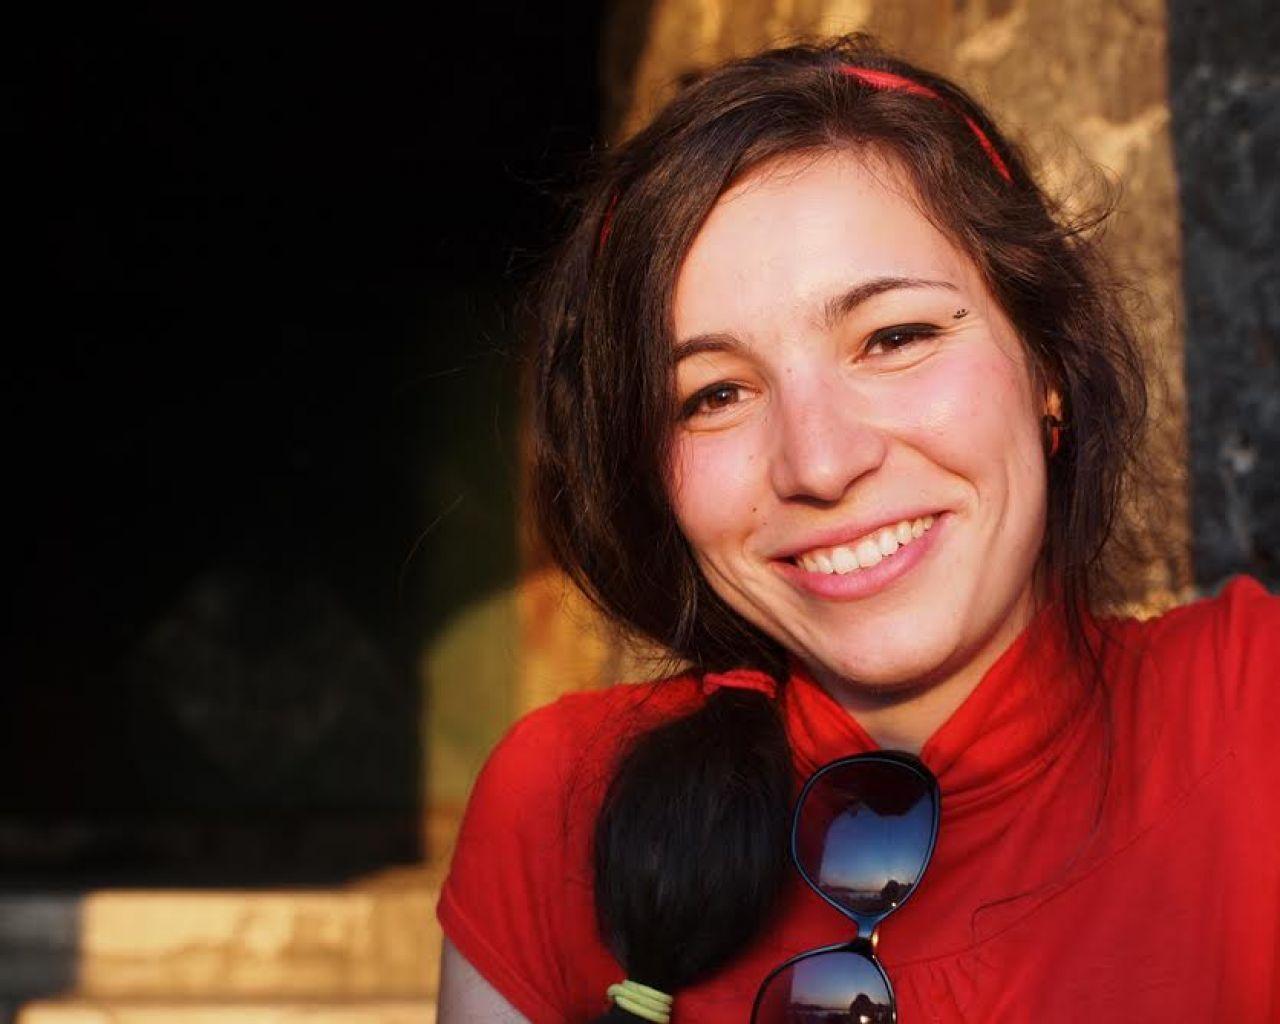 Natječaj za Nagradu Dijana Klarić